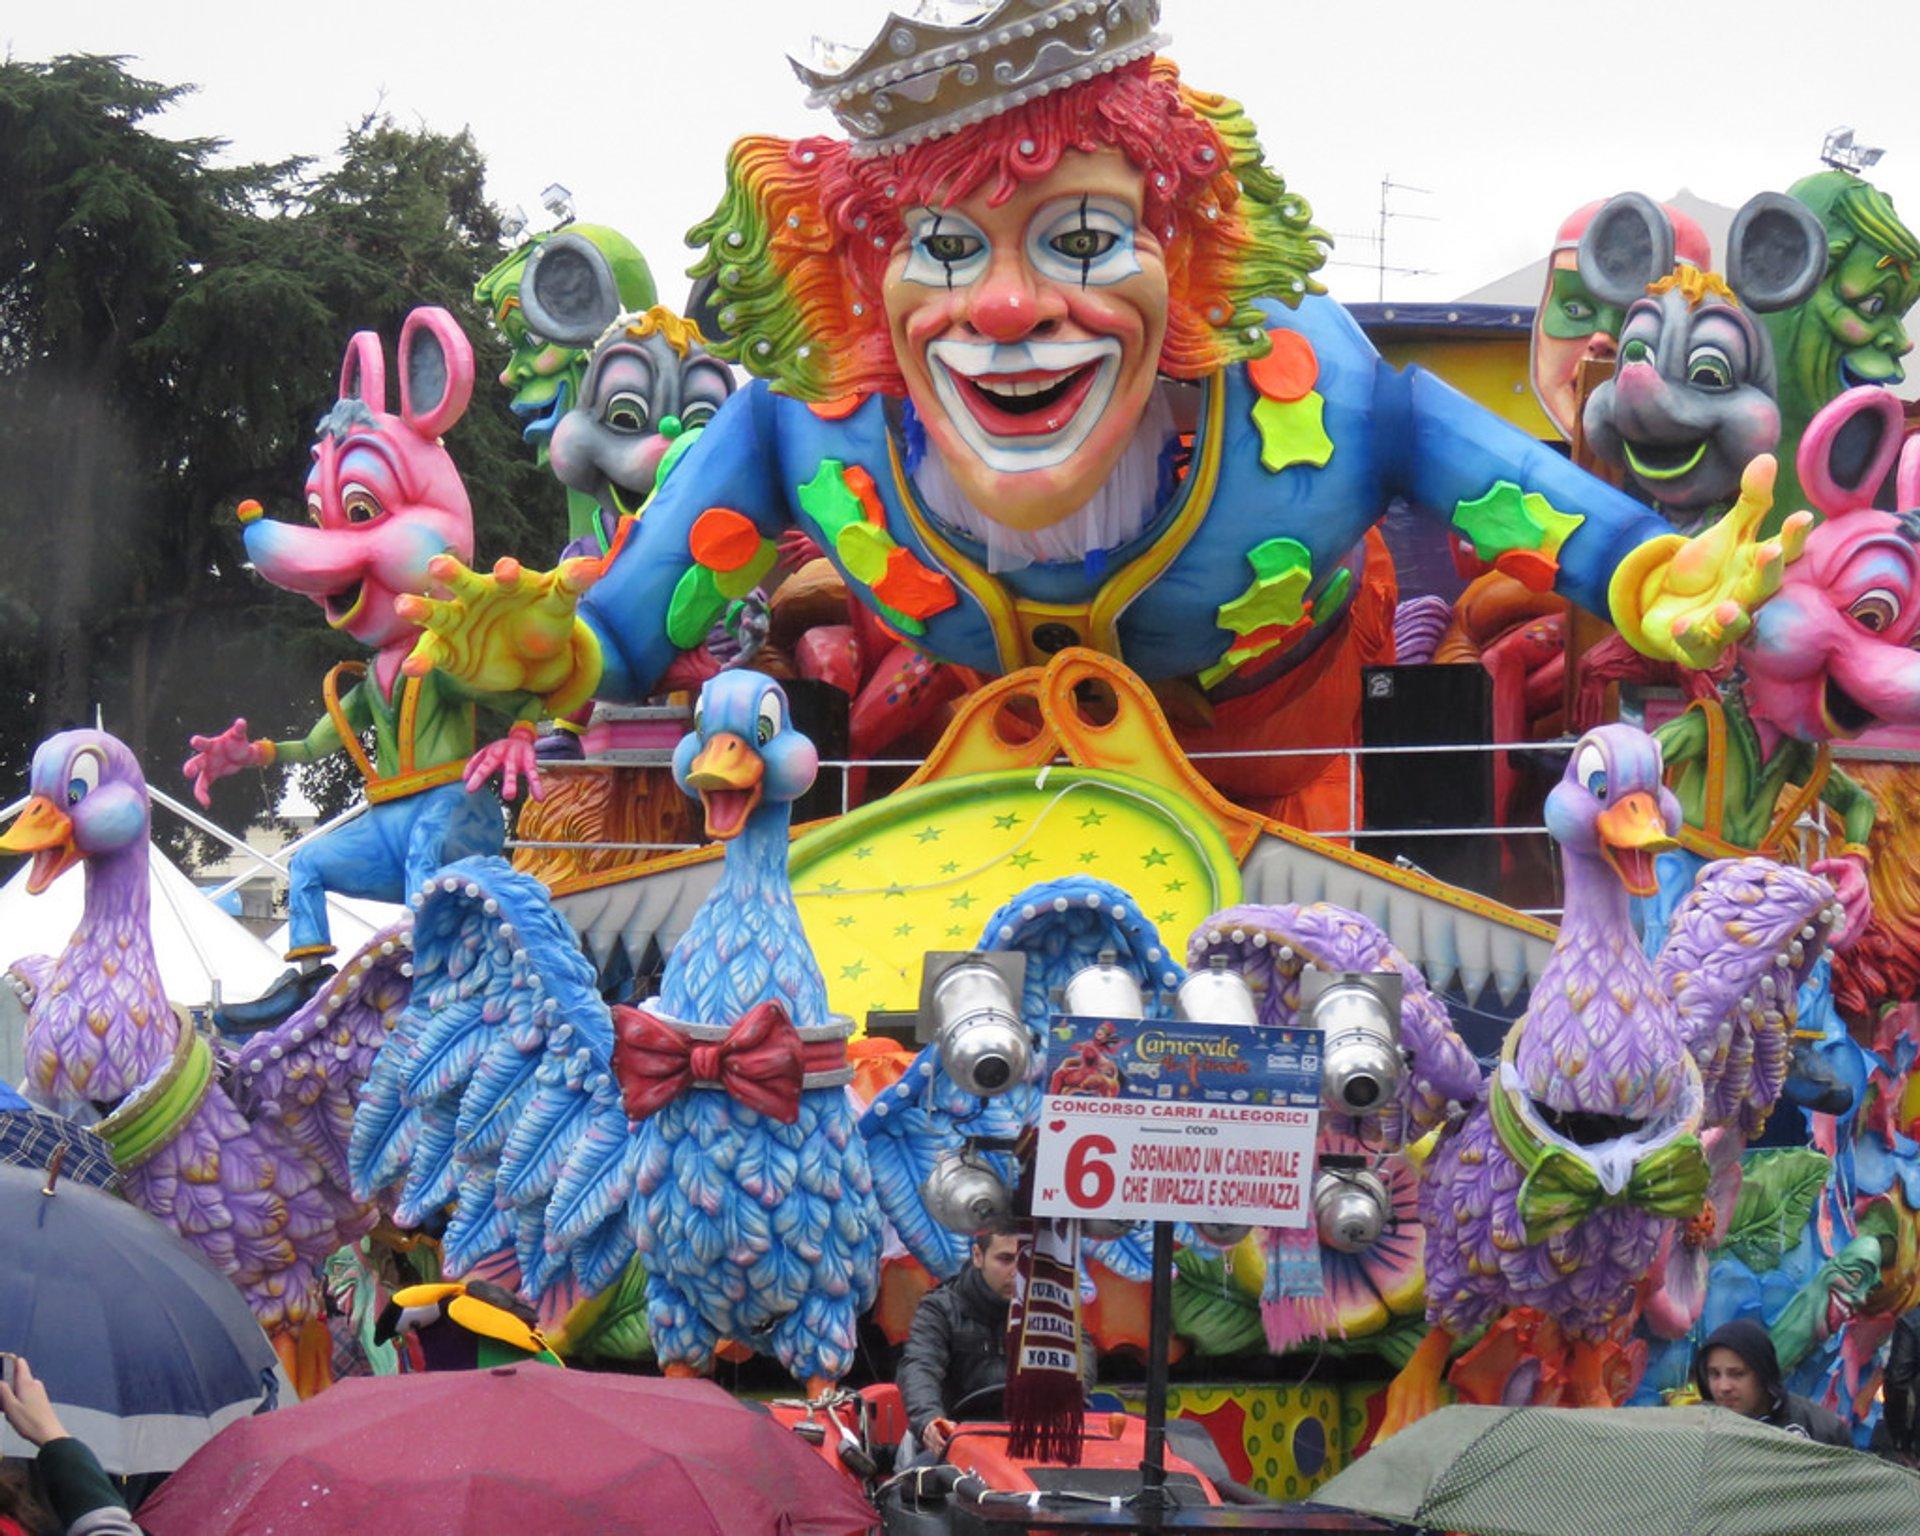 Carnevale Acireale, Sicily 2020